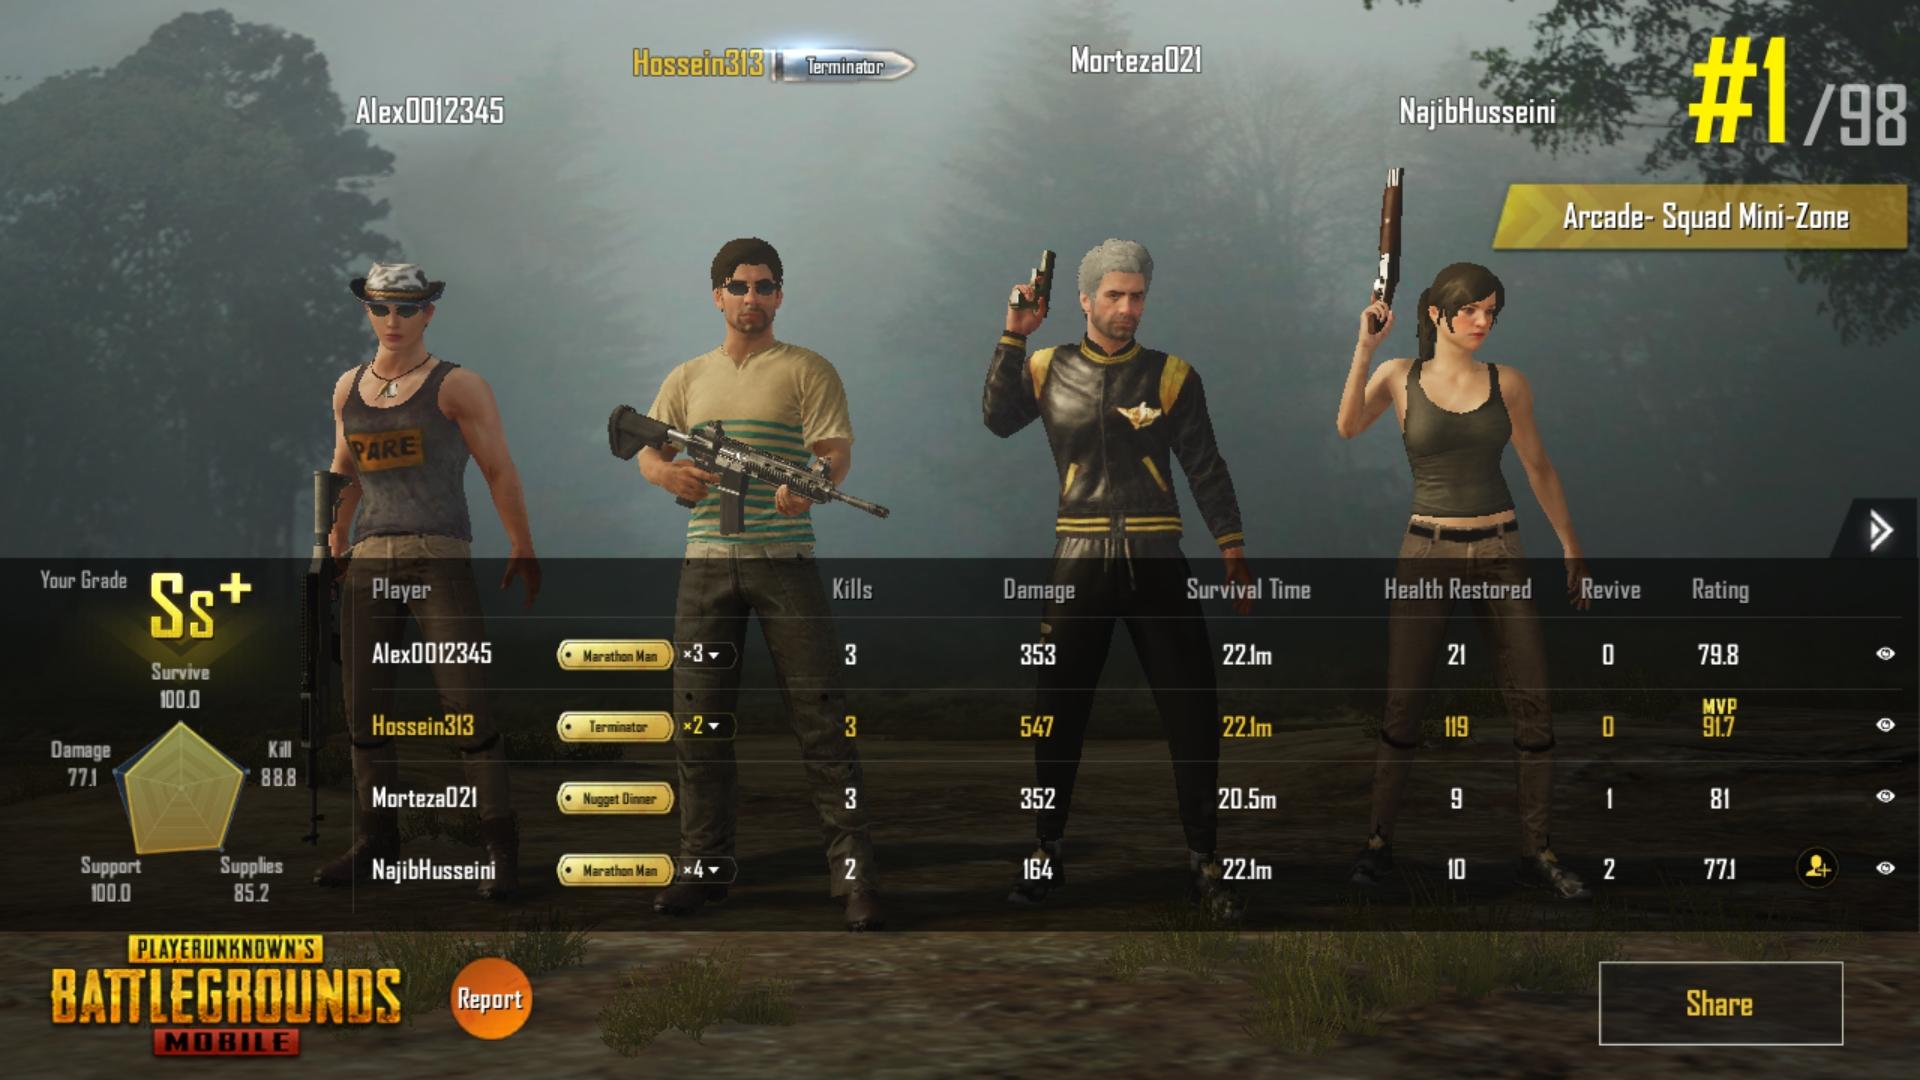 Good team